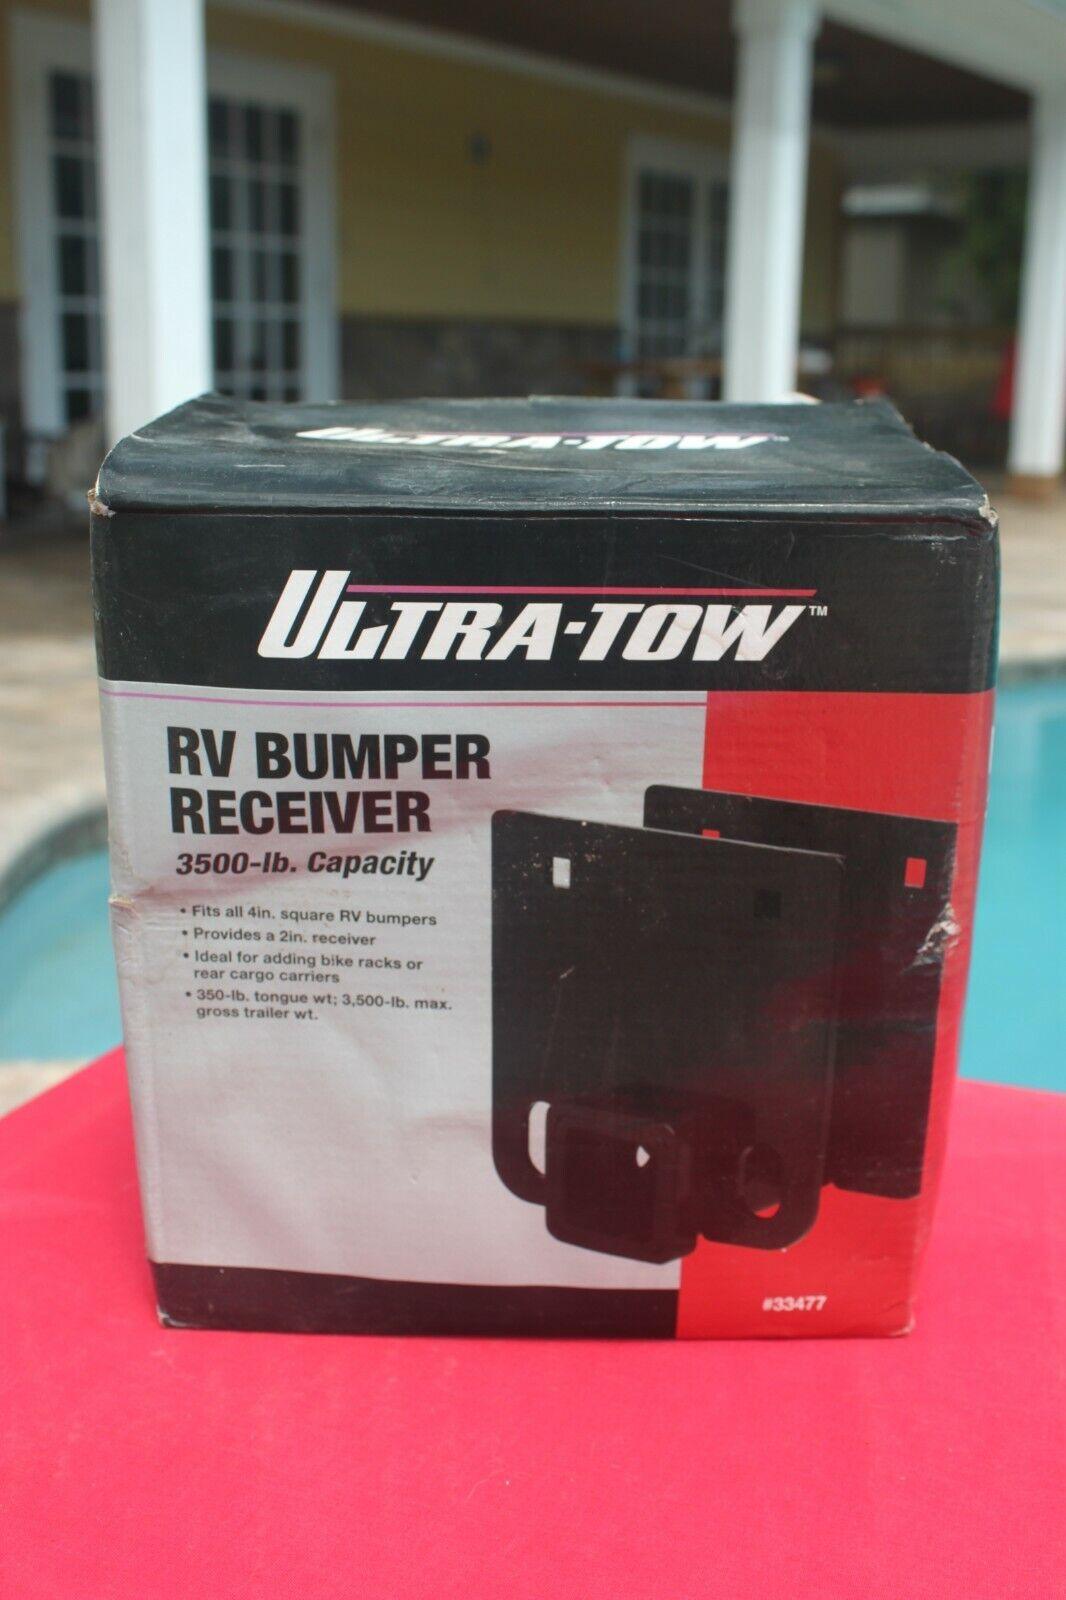 Ultra-Tow RV Bumper Receiver - Class II, 3500-Lb. GTW, 2Inch